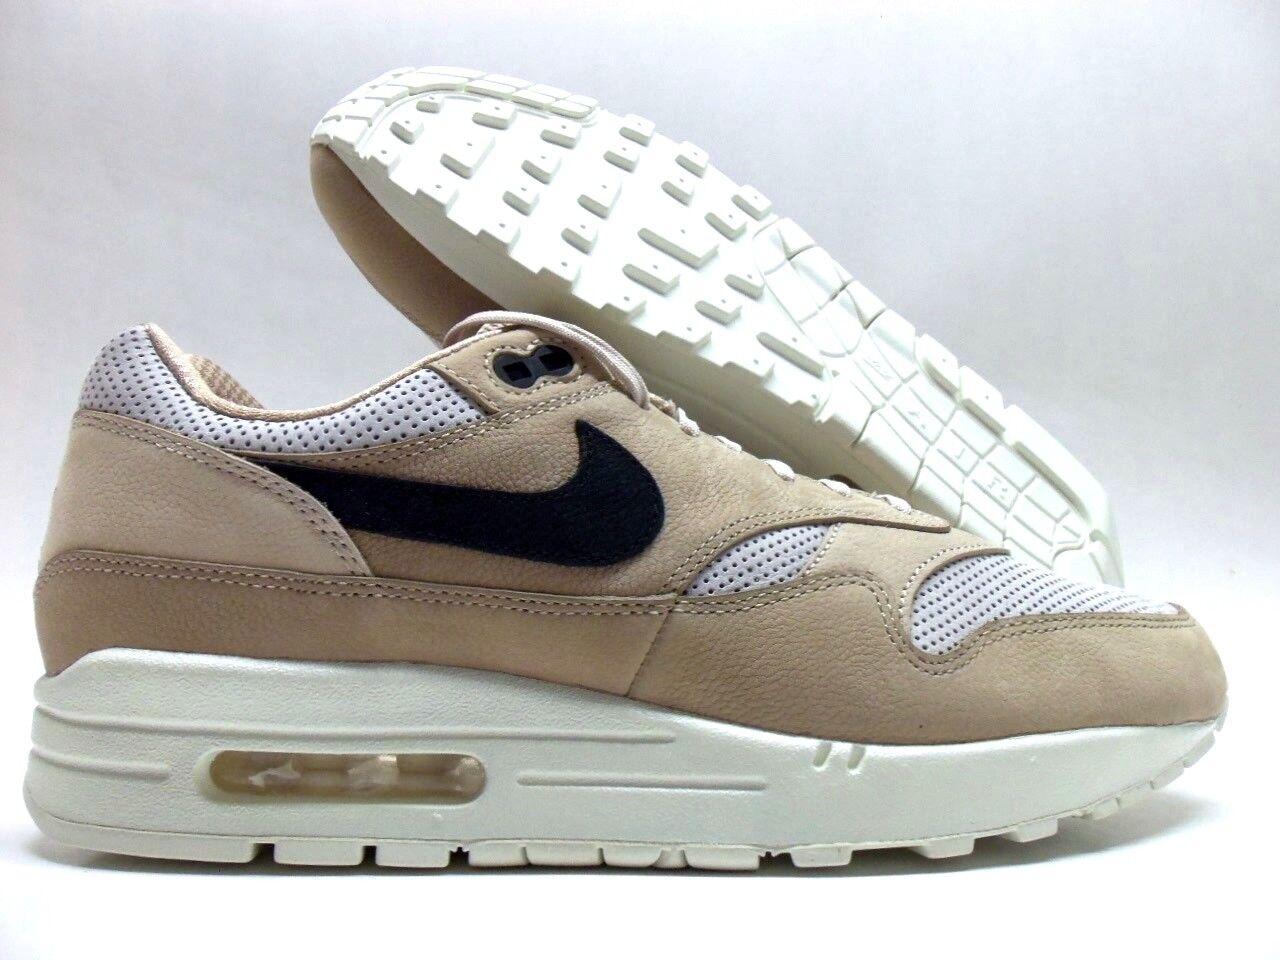 828e8e551d Nike Air Max 1 Pinnacle Mushroom/black-light Bone Size Women's 10 ...